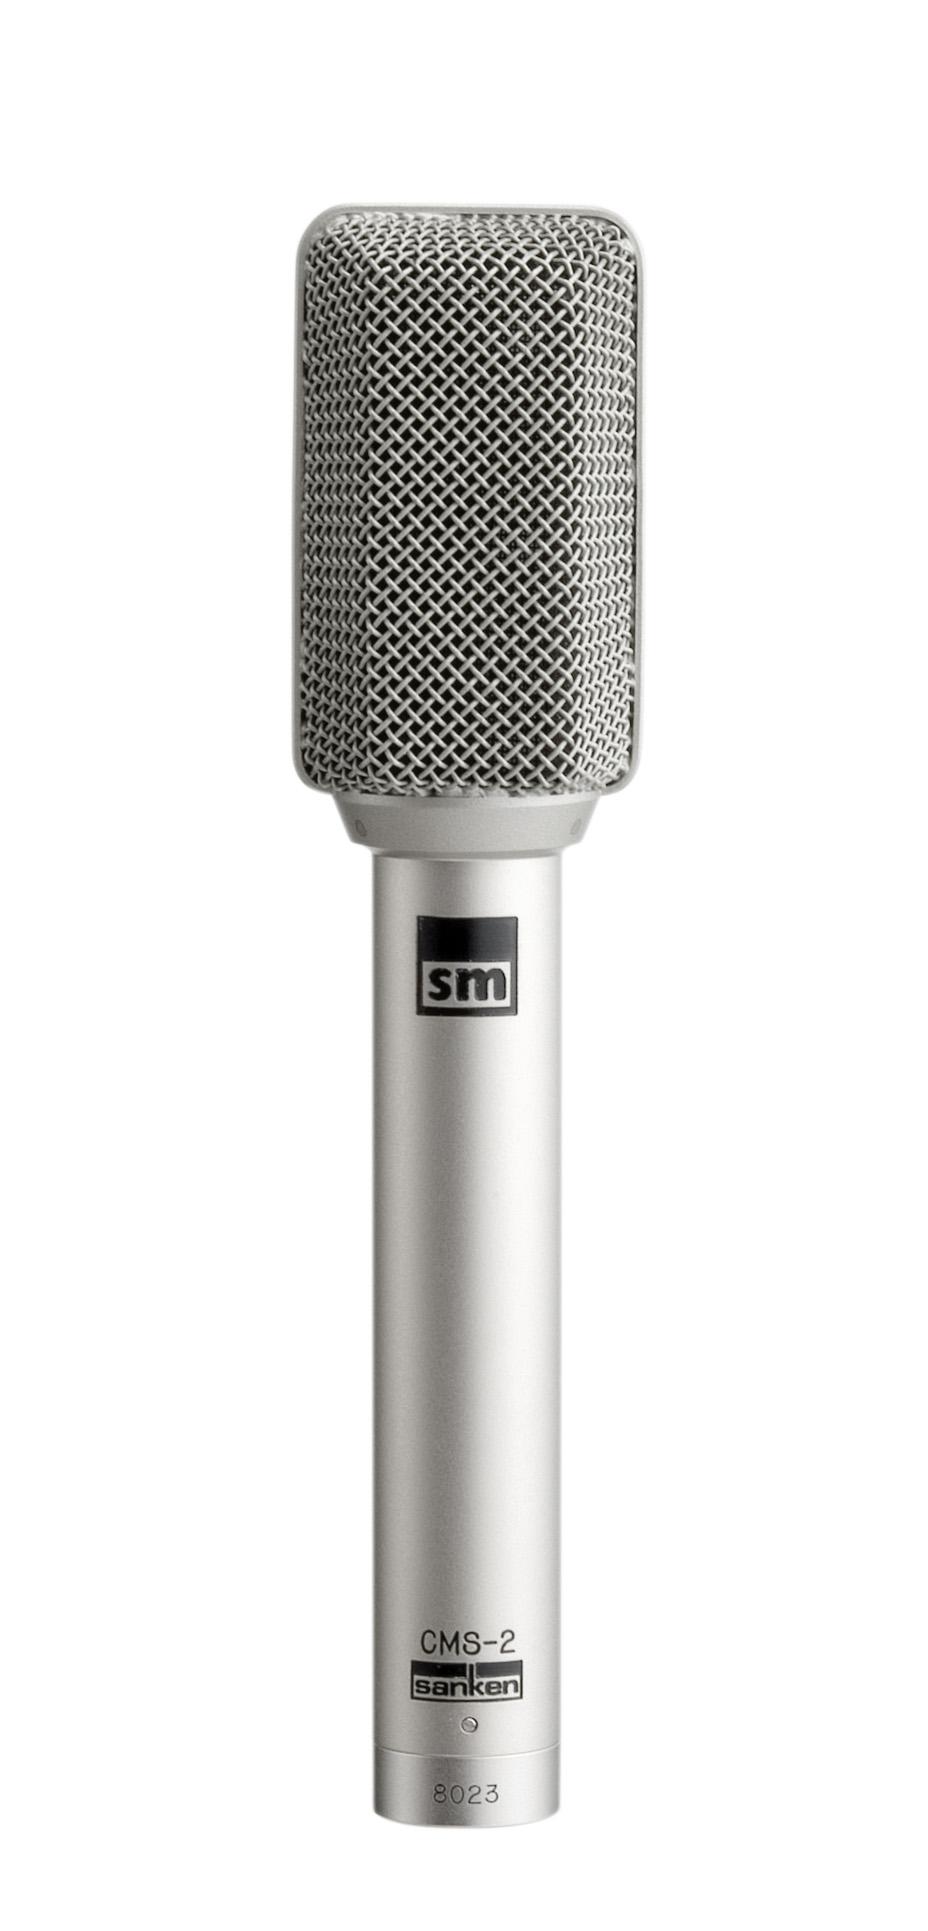 CMS-2